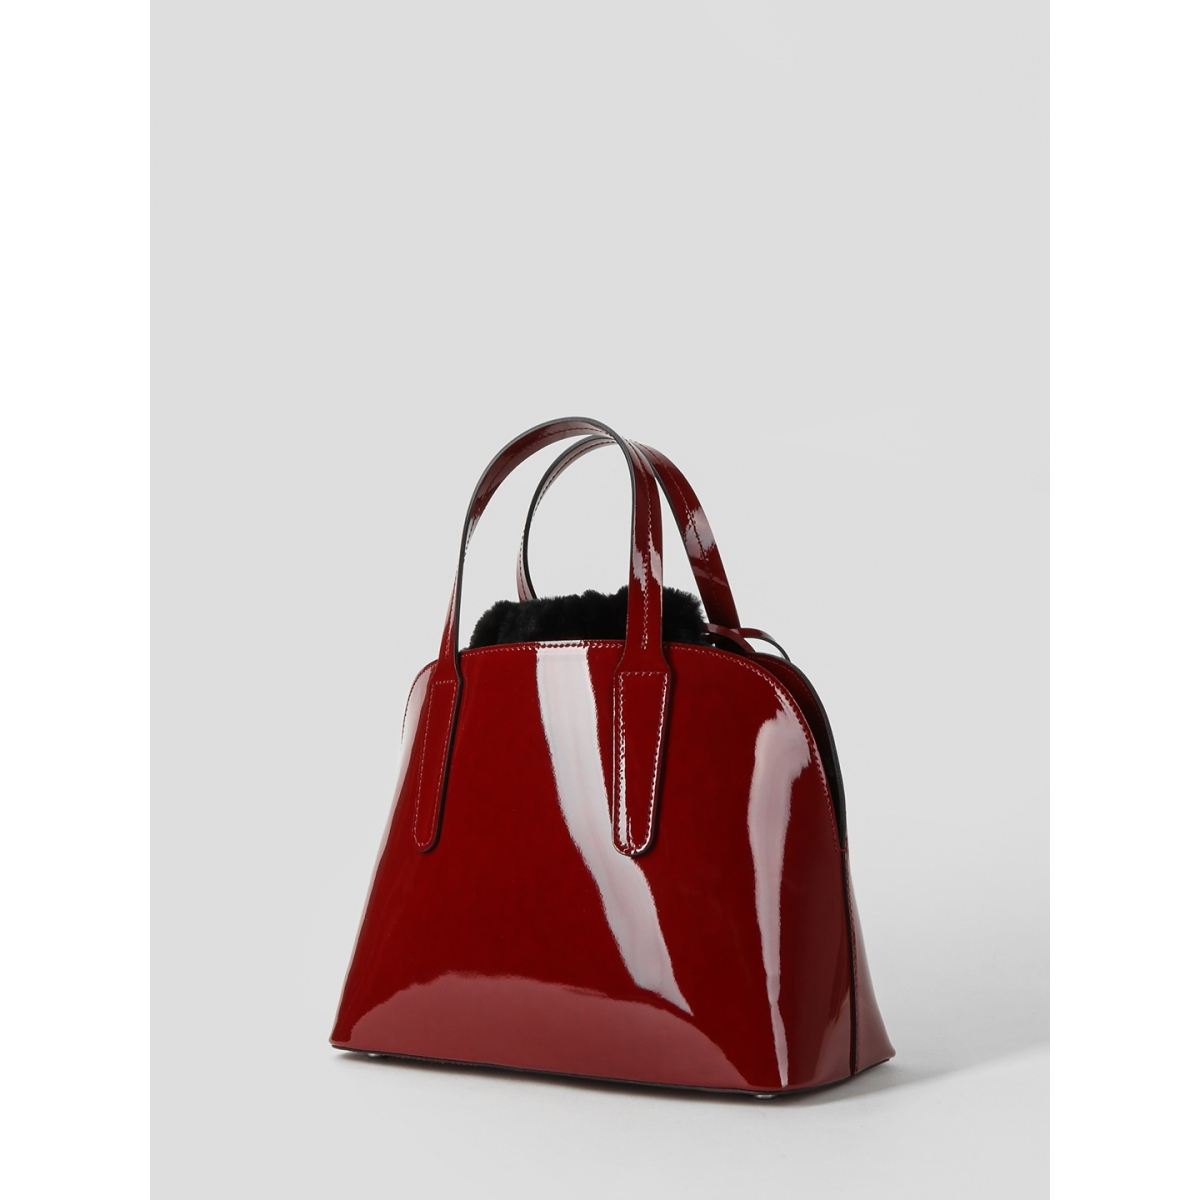 Arcadia 4708 patent rubino., сумка., женская